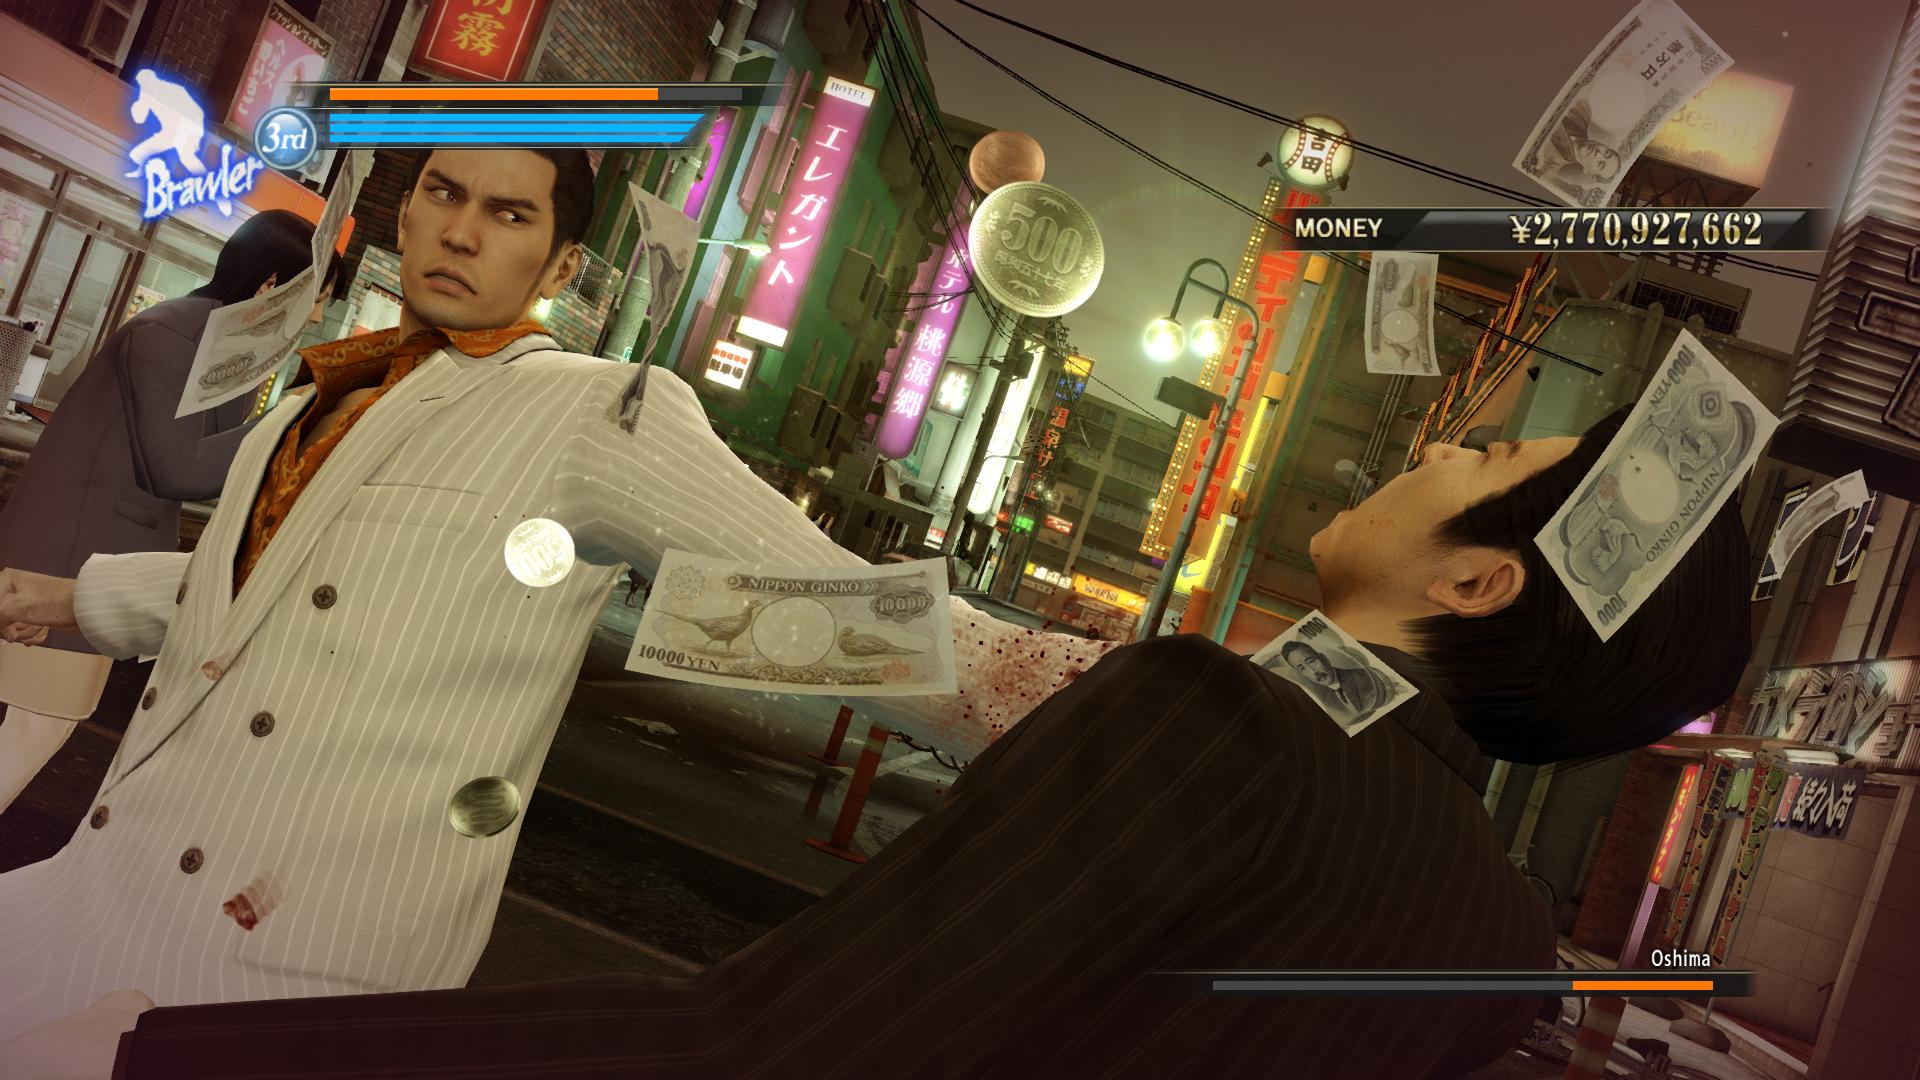 Yakuza 0 - Best Action Games 2020